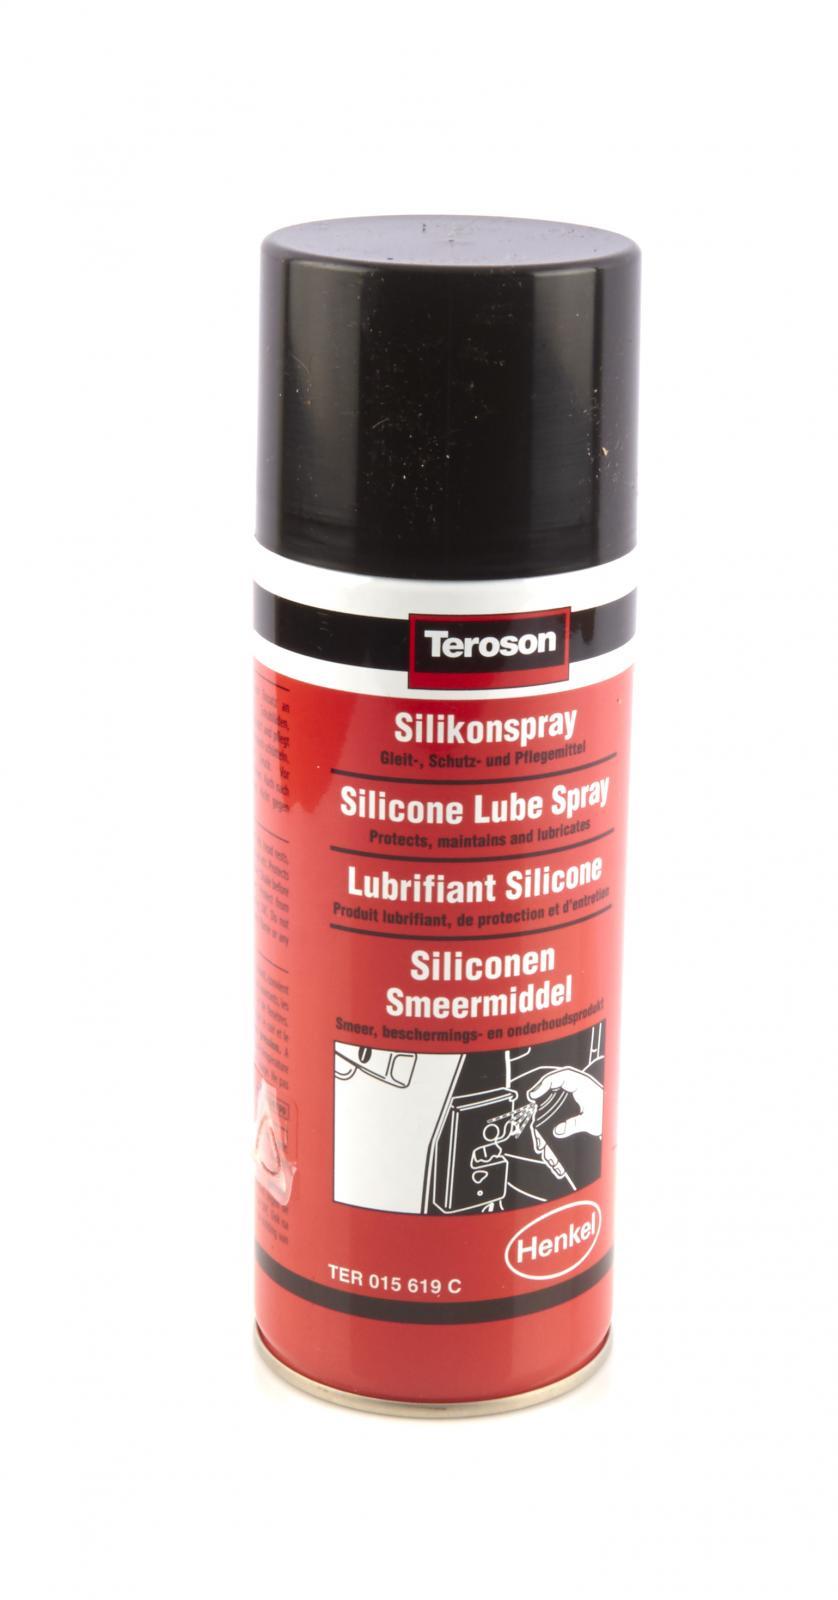 loctite teroson 400ml silikon spray 232378 silikonspray. Black Bedroom Furniture Sets. Home Design Ideas